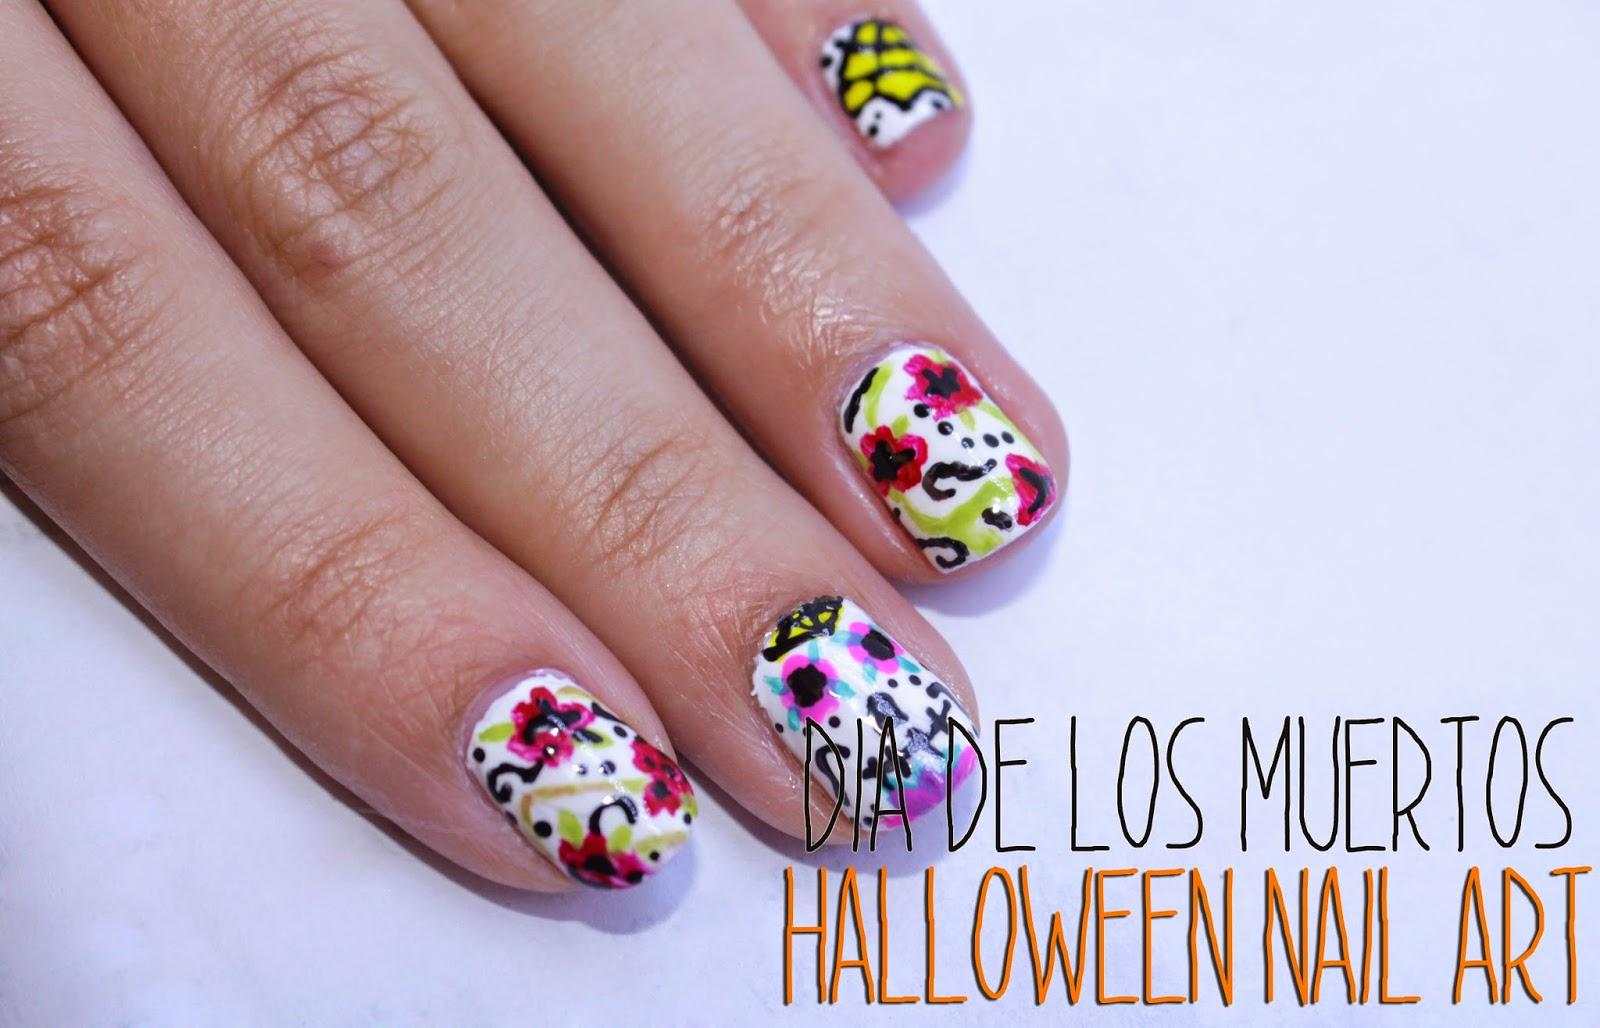 Chingu Nails: halloween nail art - Dia de los muertos